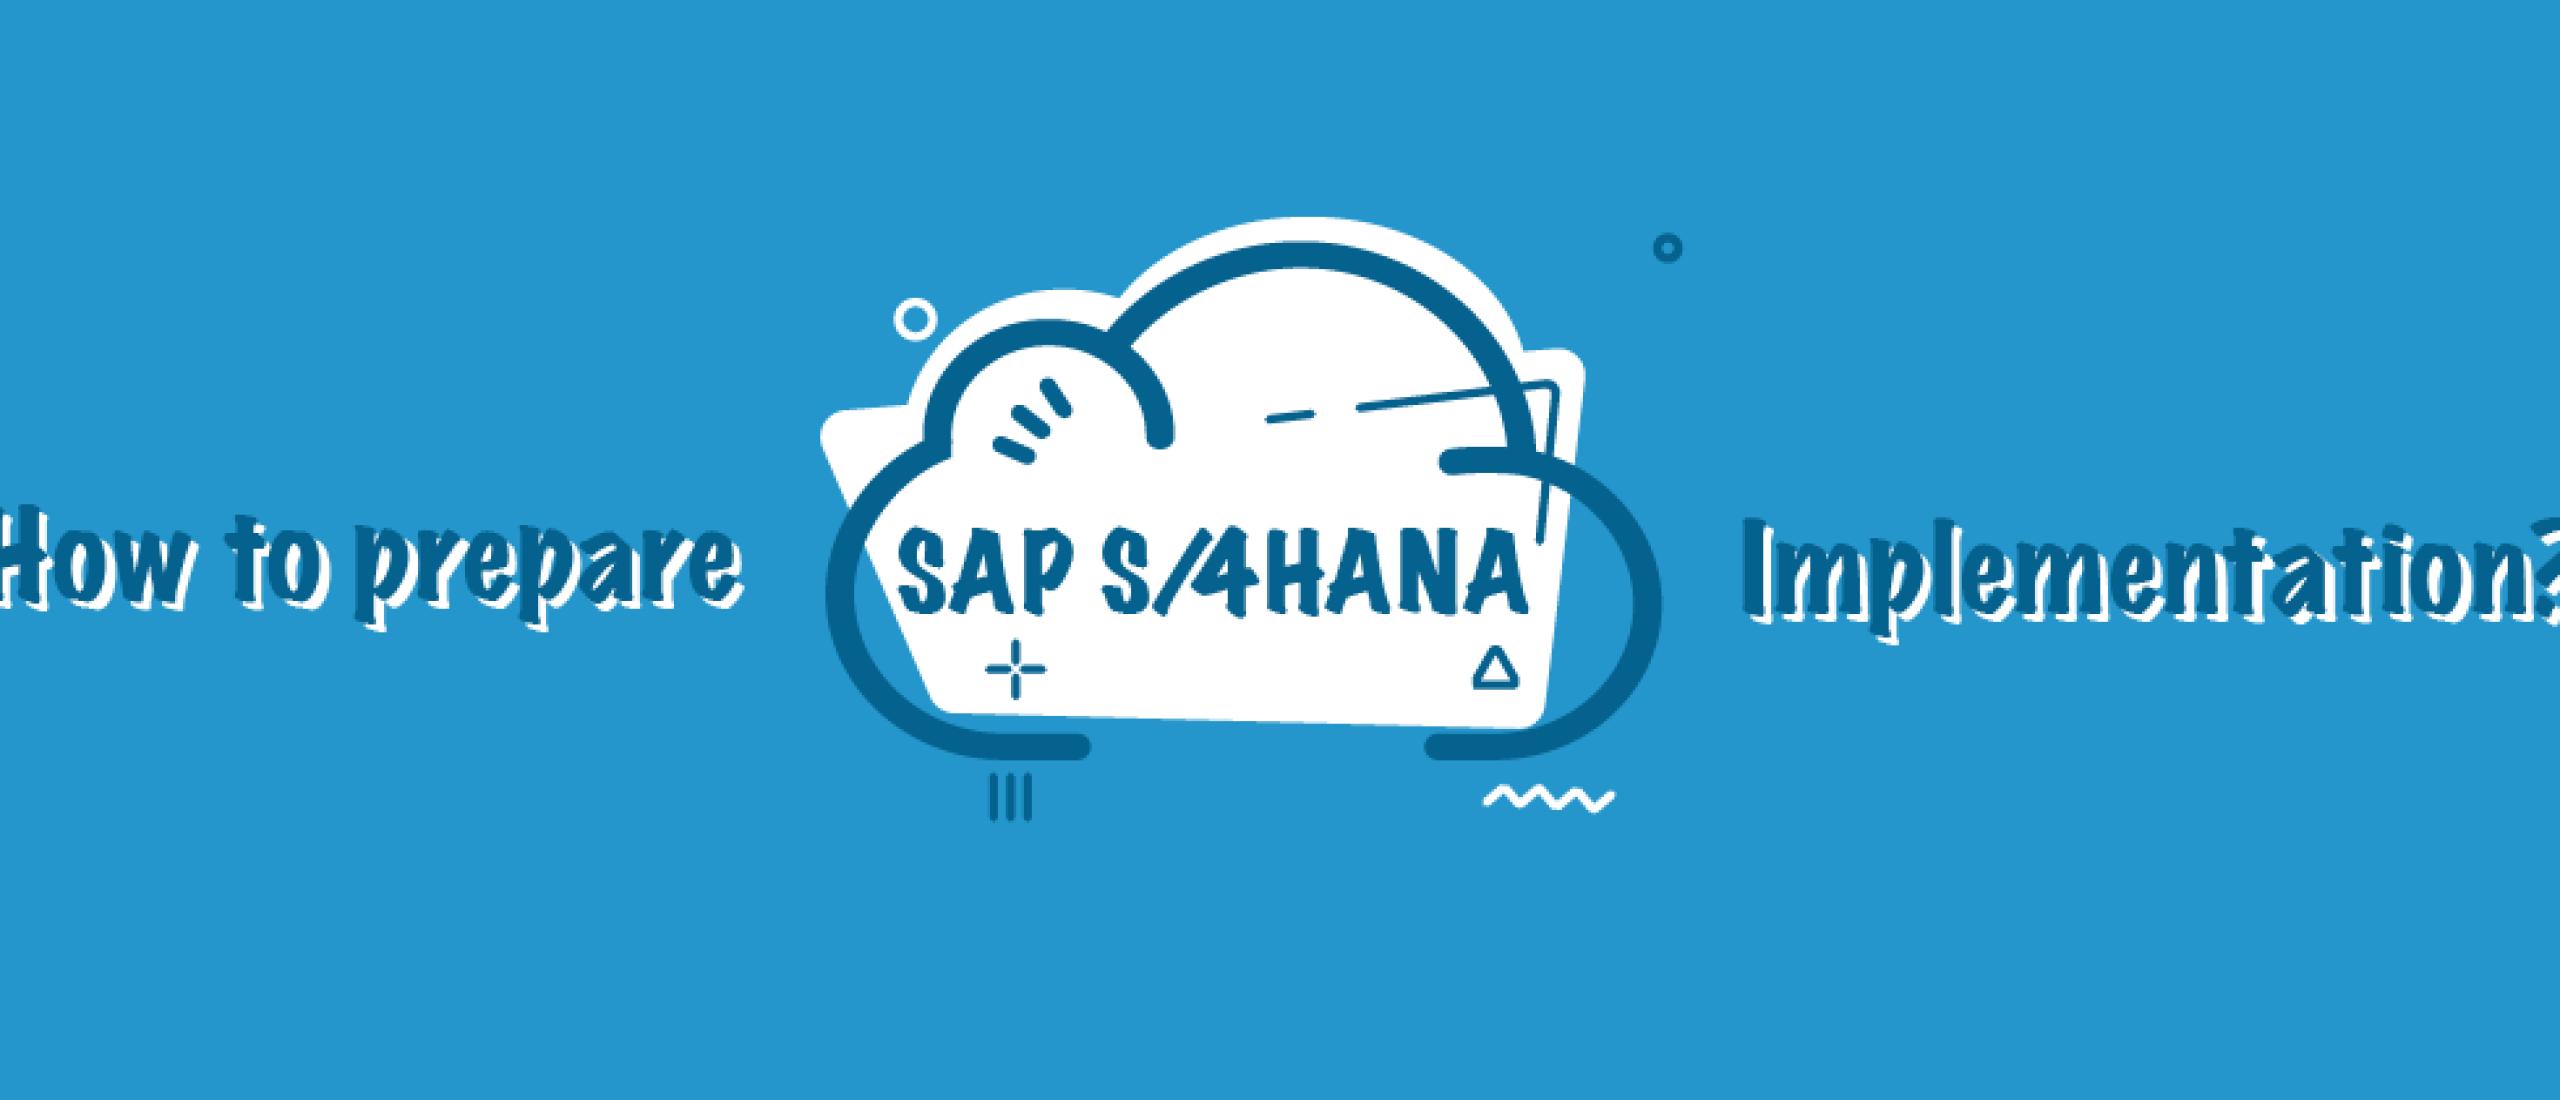 How to prepare for a SAP S/4HANA Cloud transformatiion